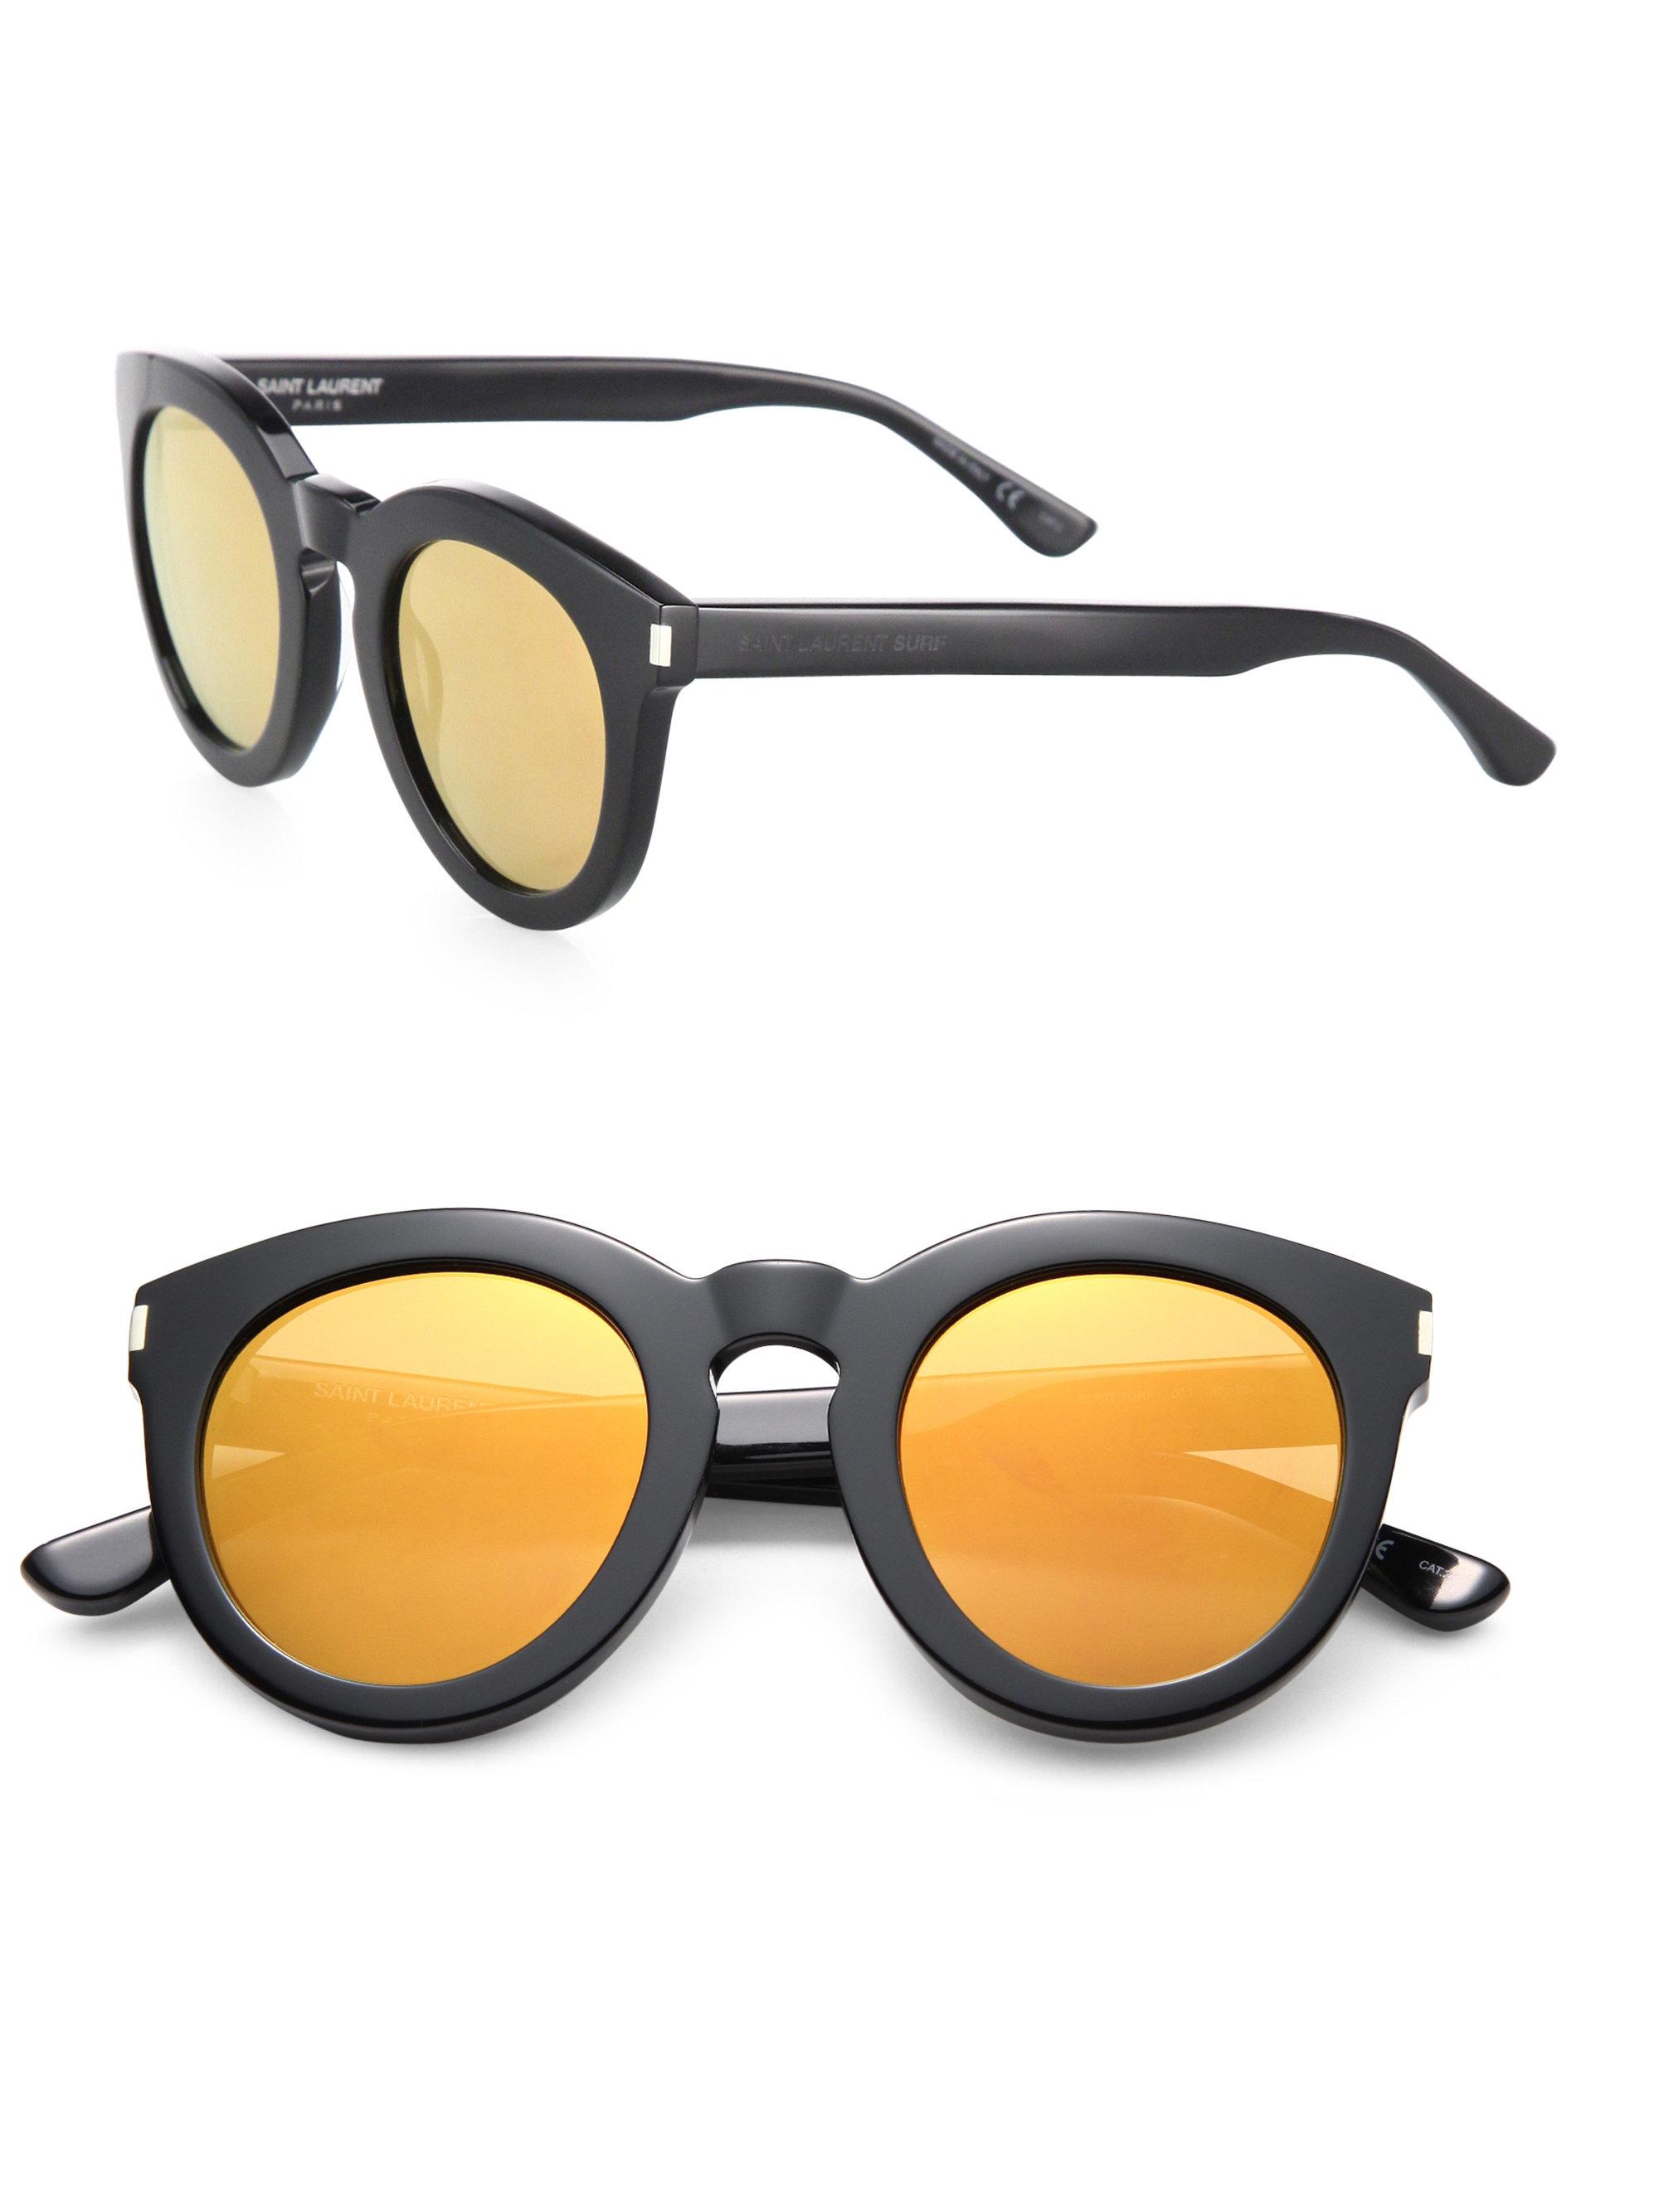 8e1e9bd1fe27 Saint Laurent Surf 47mm Round Sunglasses in Yellow - Lyst